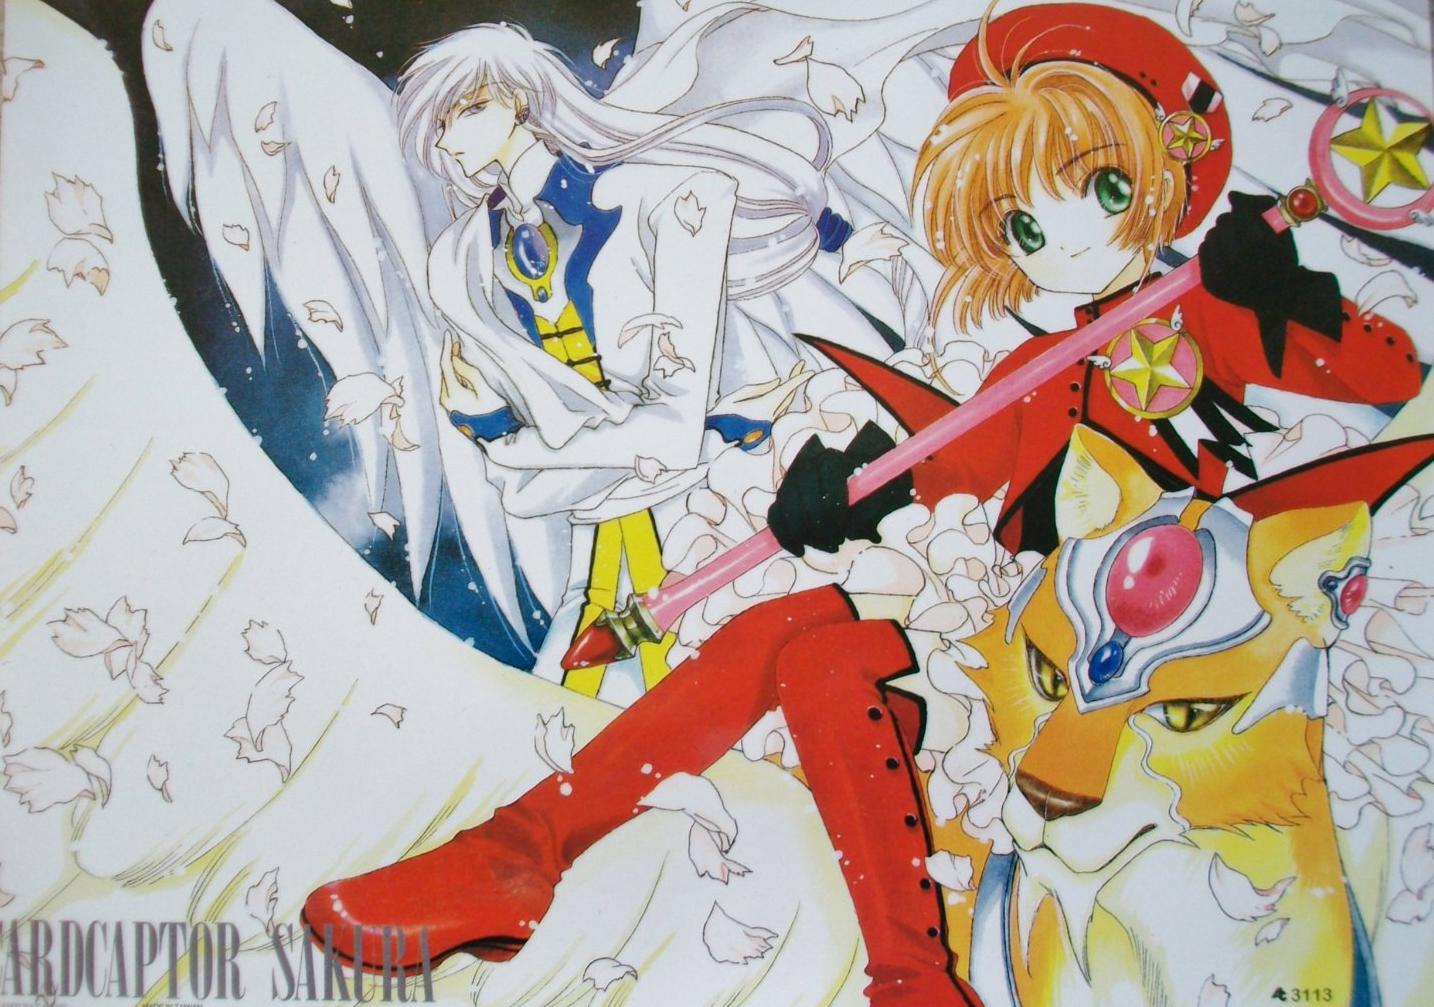 yue, sakura kinomoto, kero, keroberos, cardcaptor sakura, card captor sakura, anime, manga